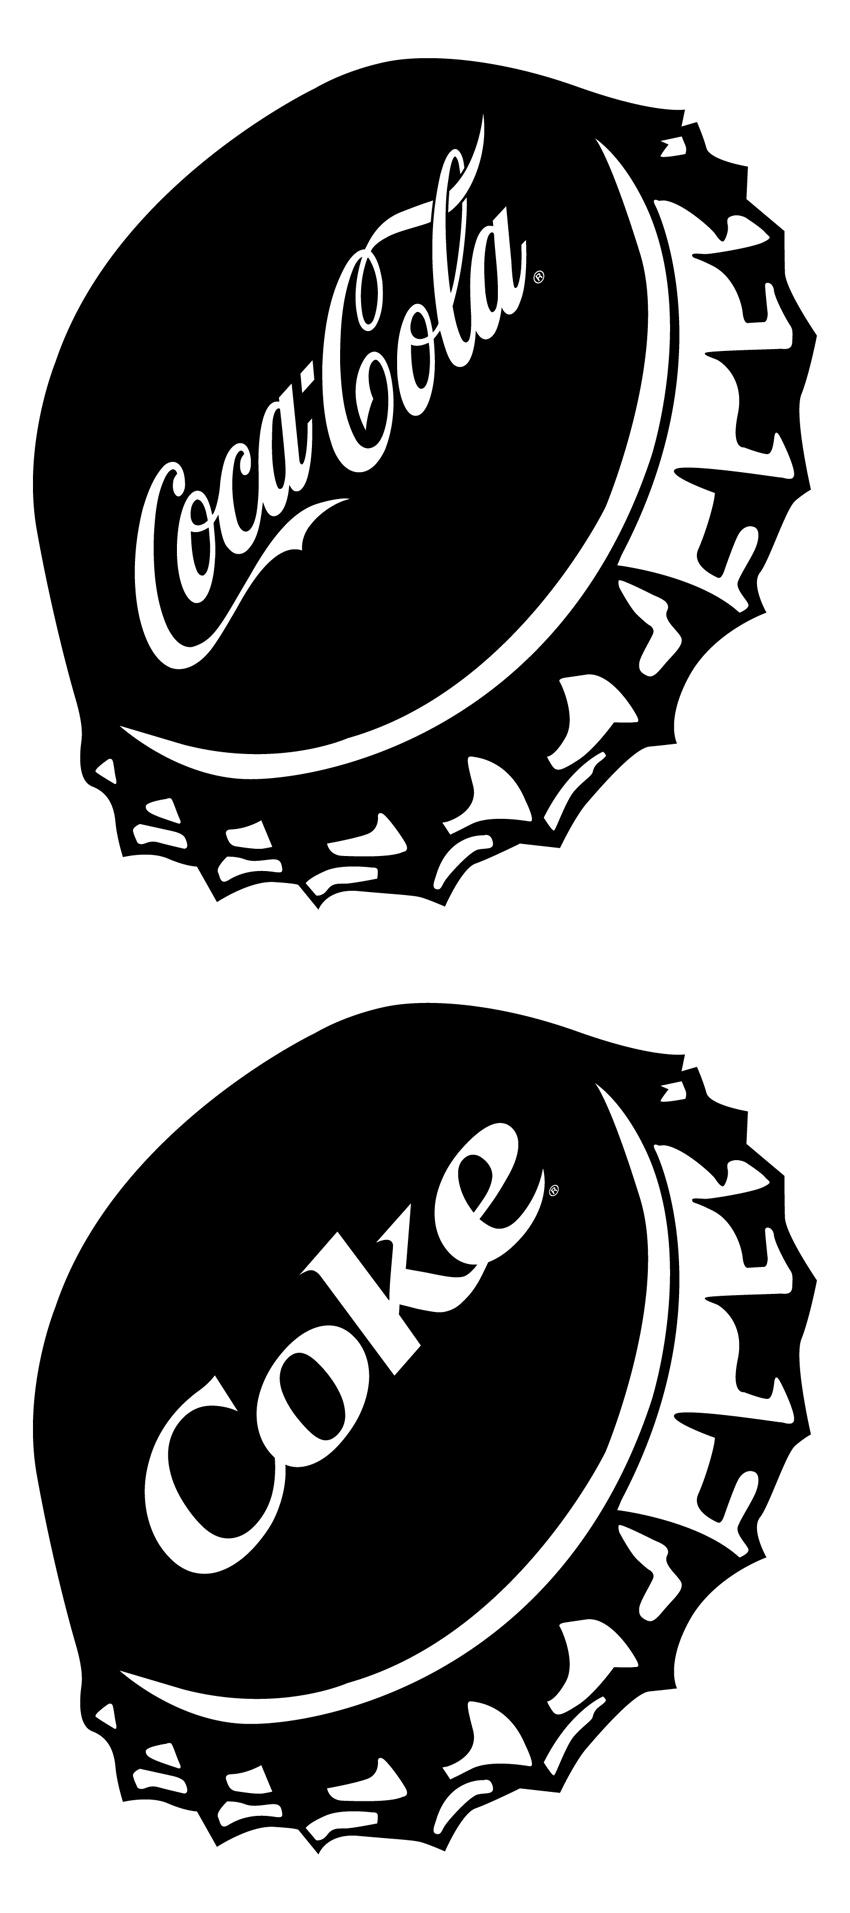 coca cola clip art free logo - photo #30